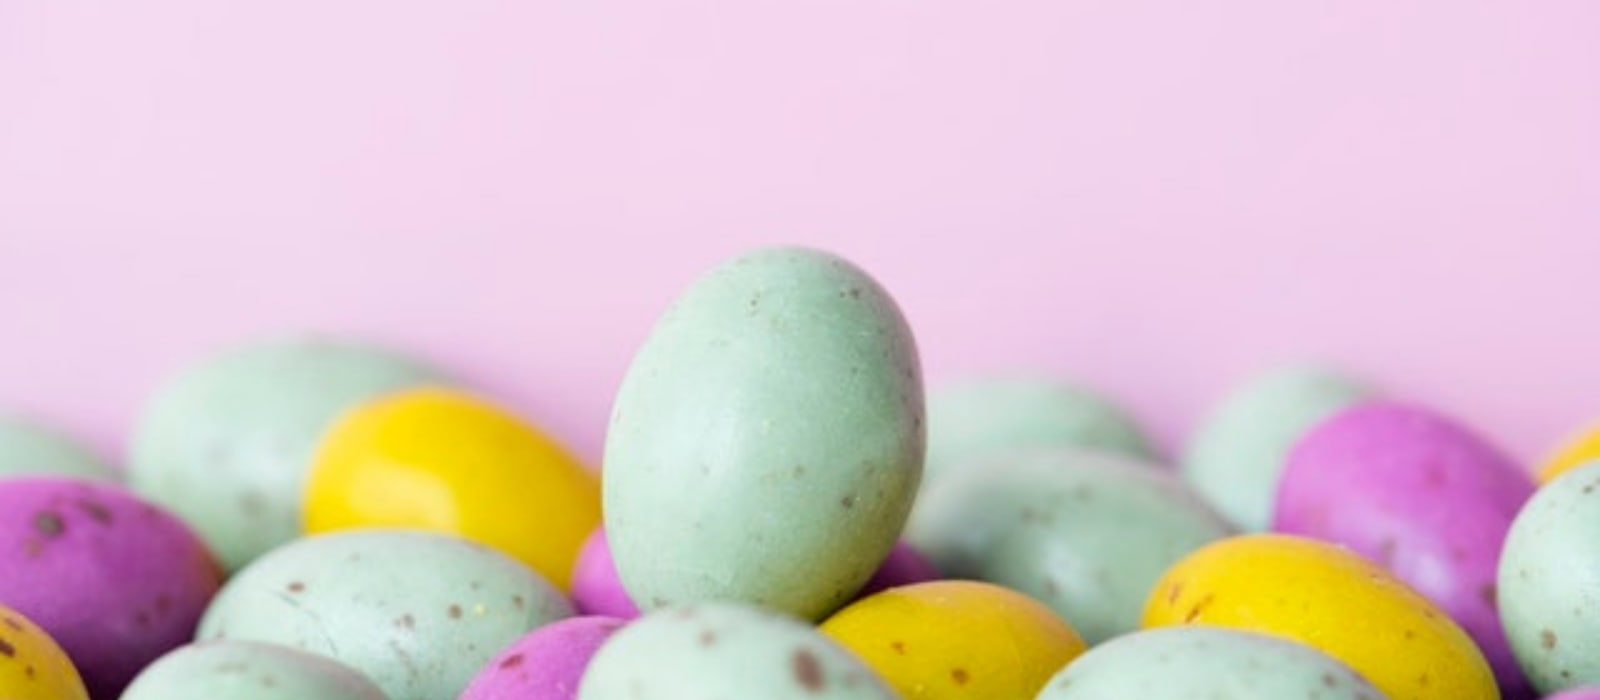 Adult Easter Egg Hunt | Host Adult Easter Egg Hunt | Adult Fun | Easter | Eggs | #easter #creative #adultegghunt #eggs #creative